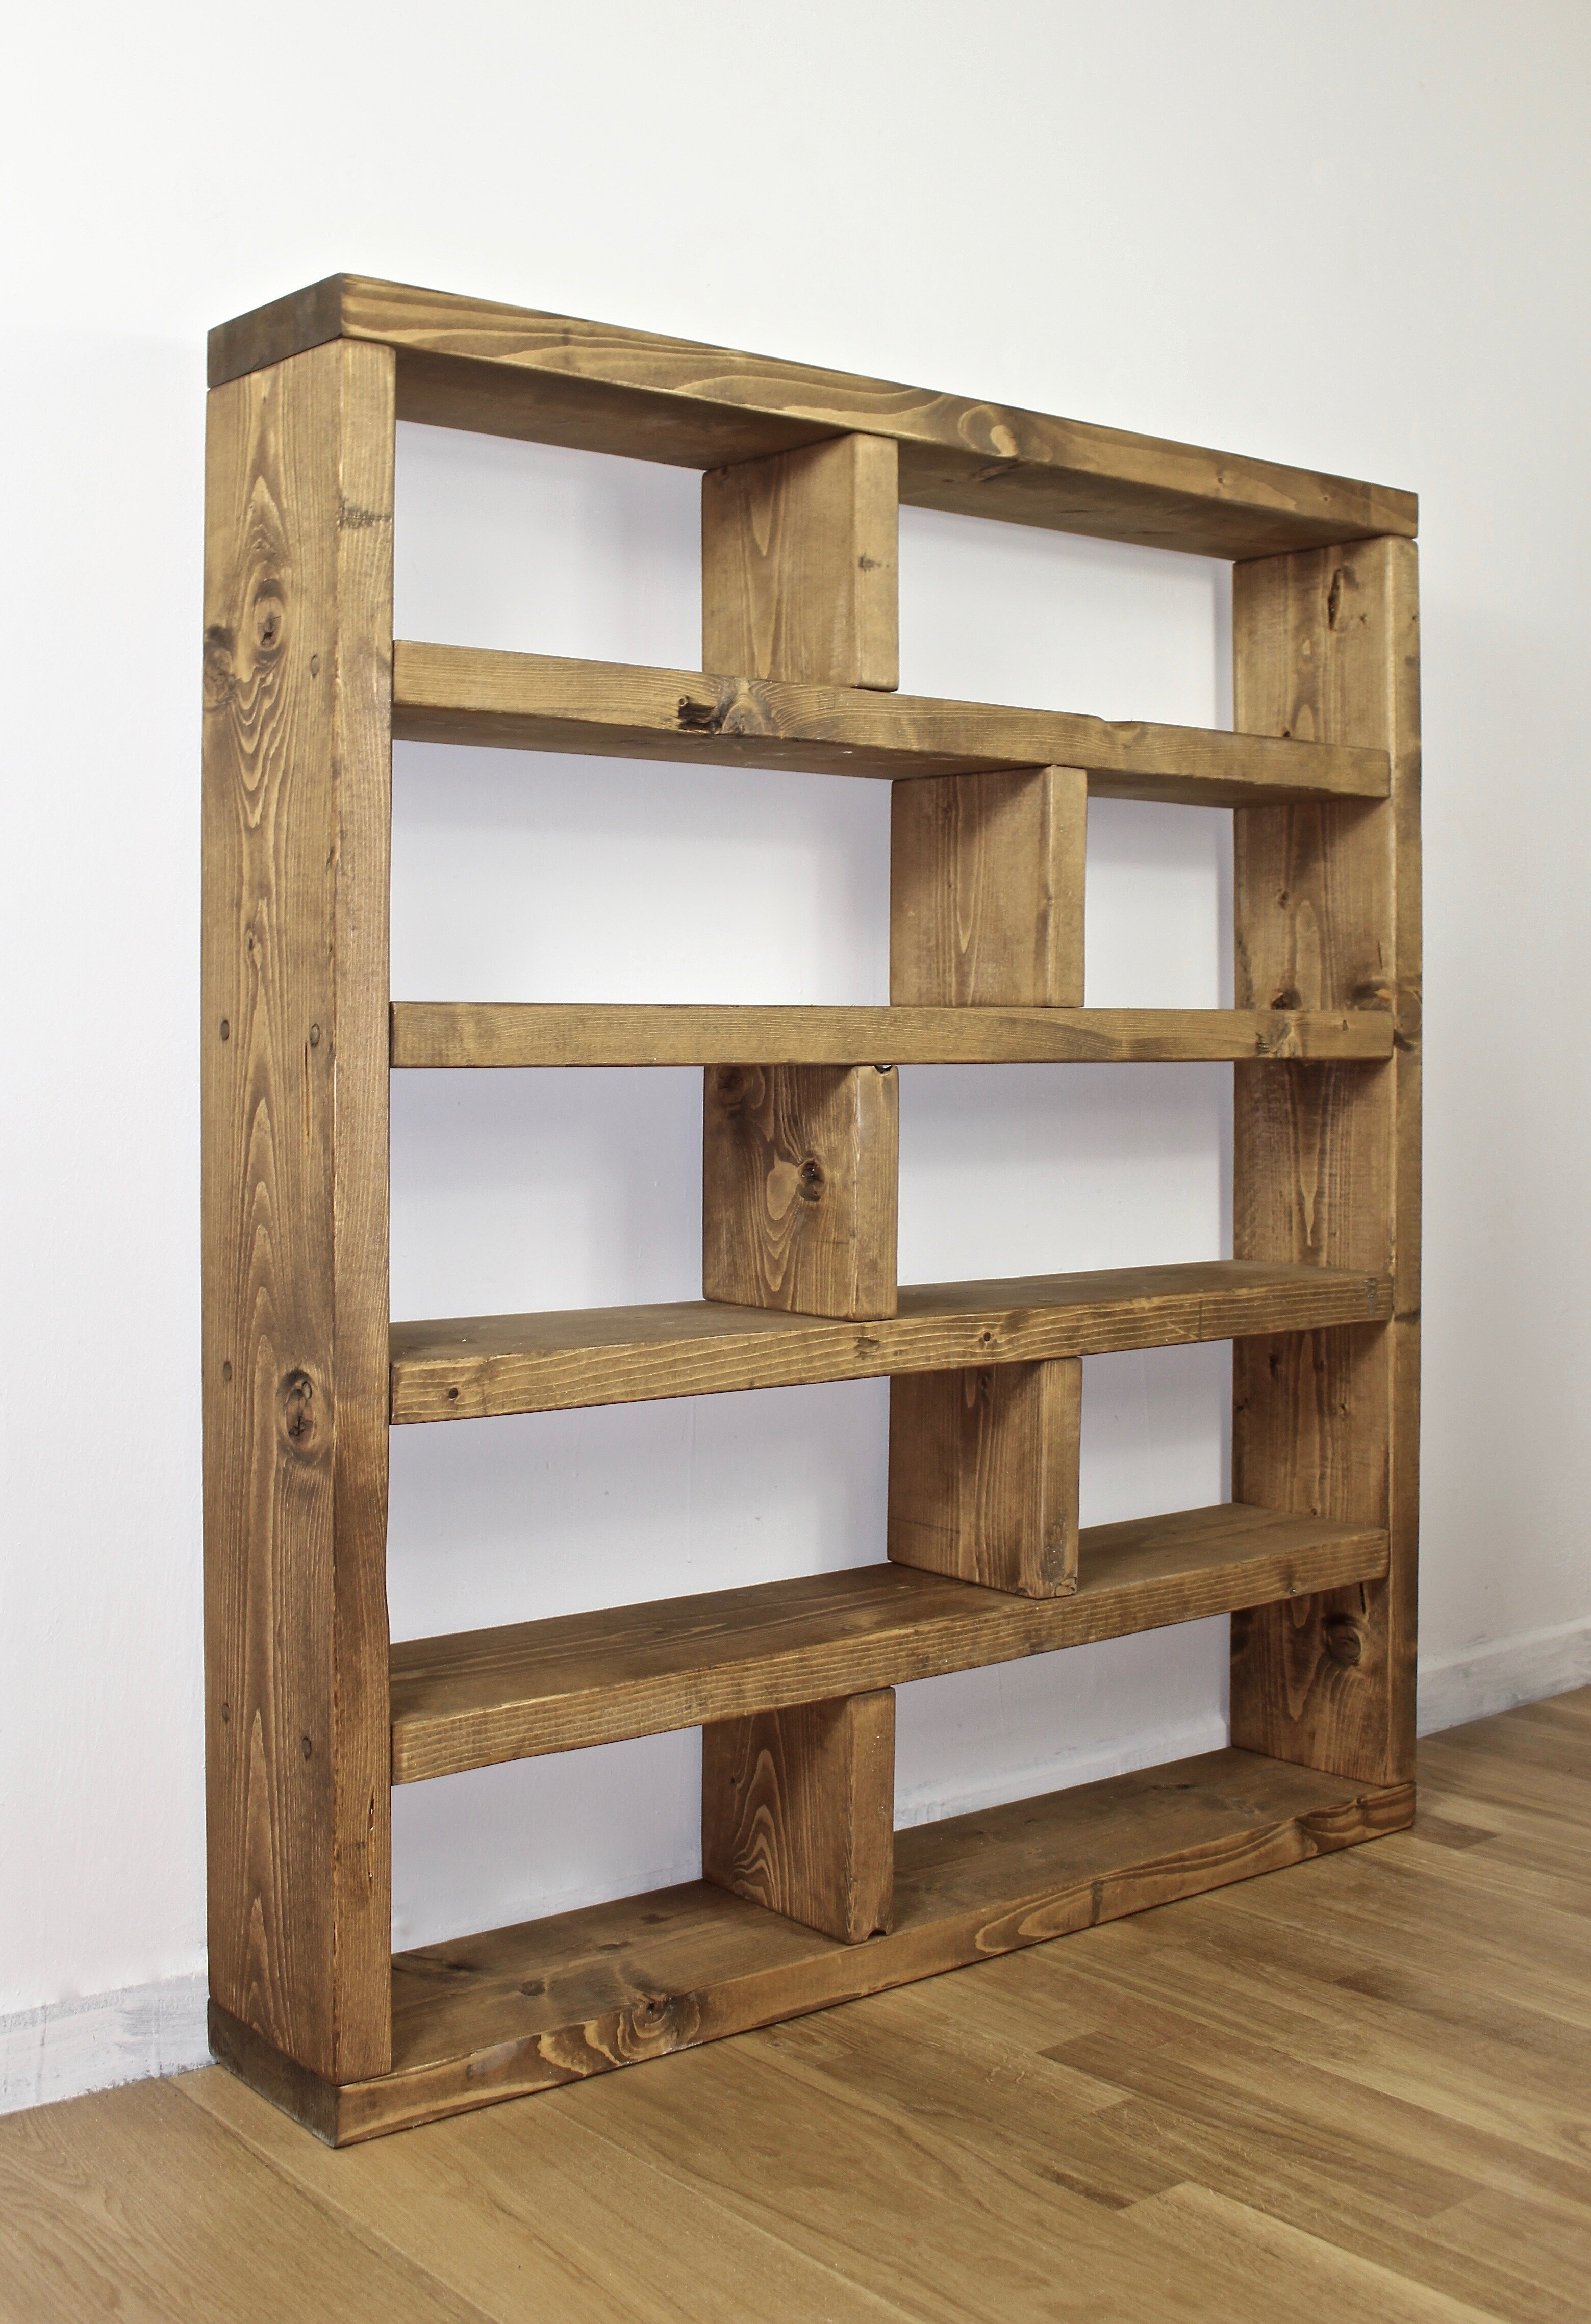 wayfair bookshelf mercury bookcase lillis co pdp row reviews furniture uk letter